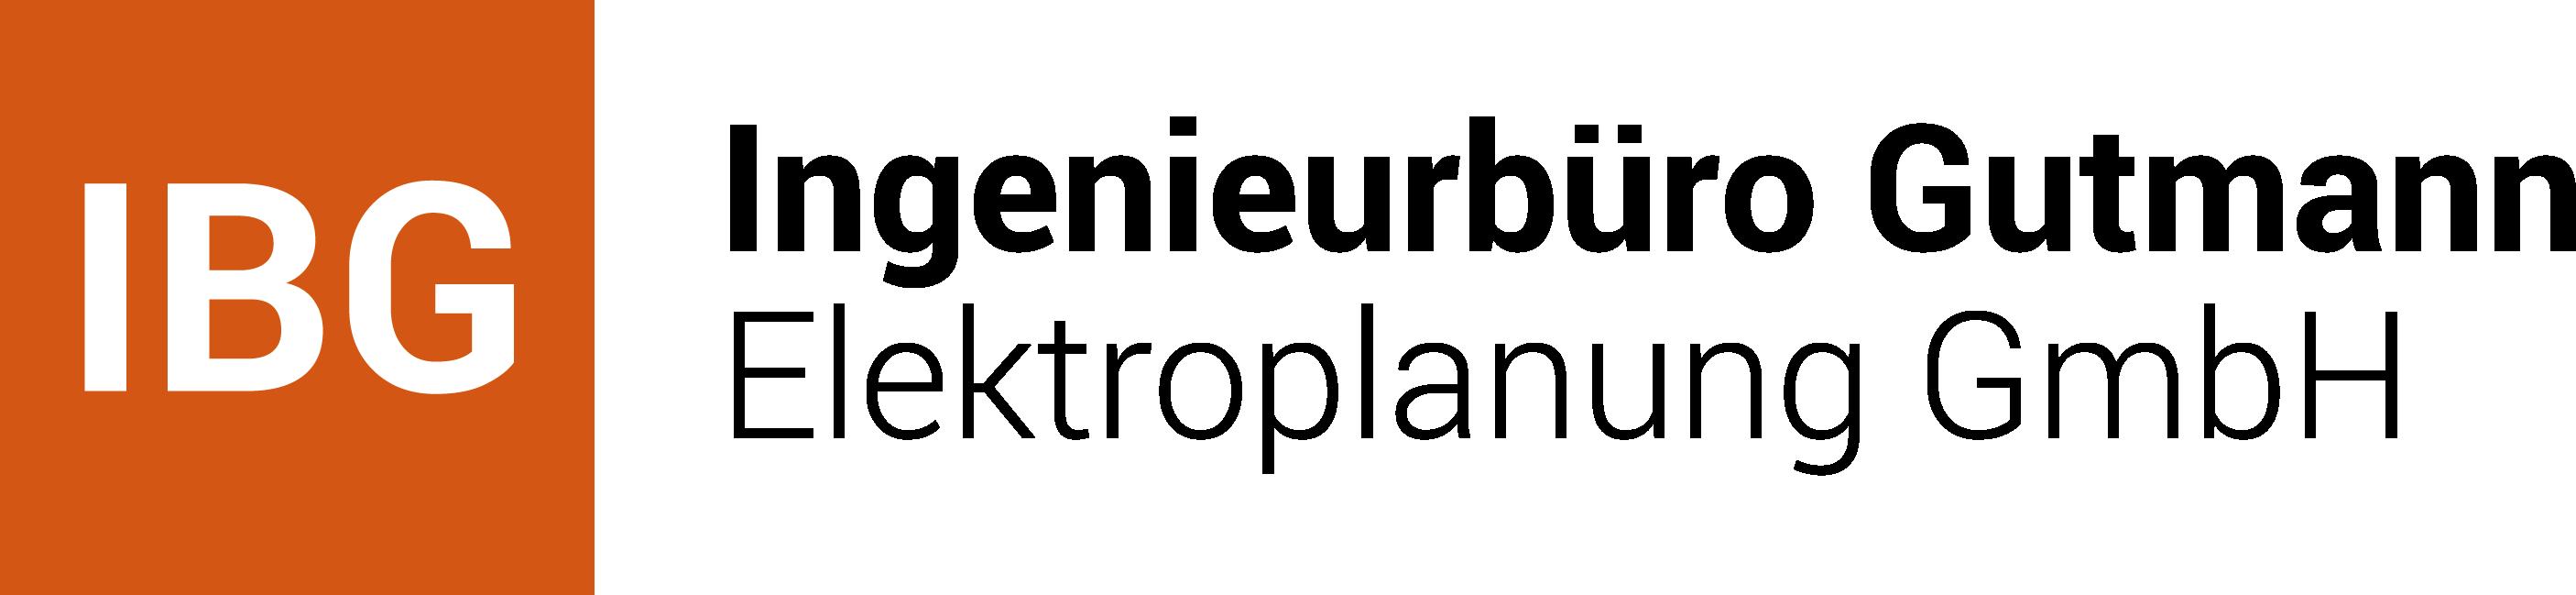 Ingenieurbüro Gutmann